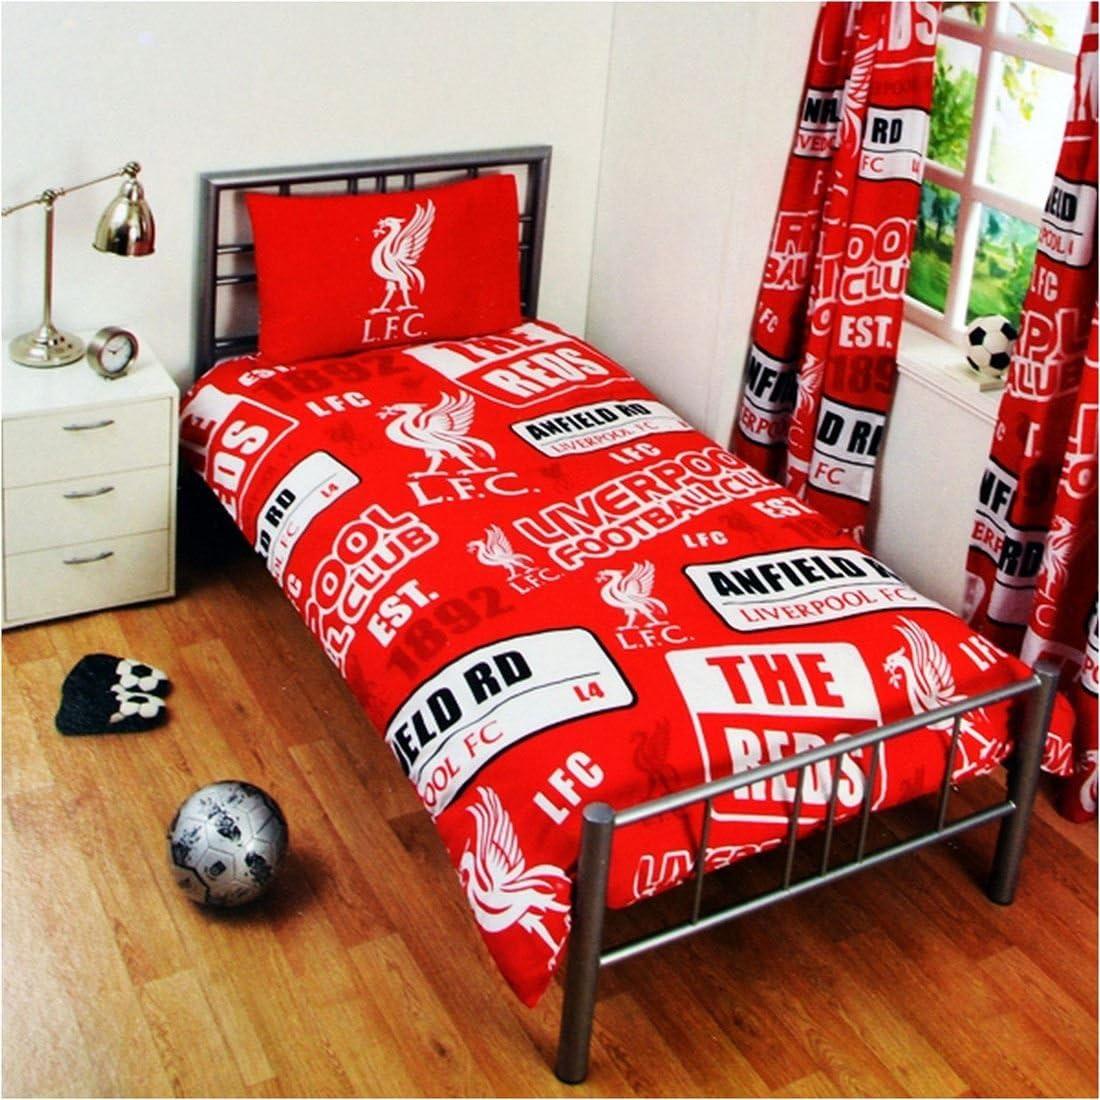 New Football Club Single Duvet Quilt Cover Sets Boys Kids Bedroom Bedding Gift Bedding Com Other Bedding